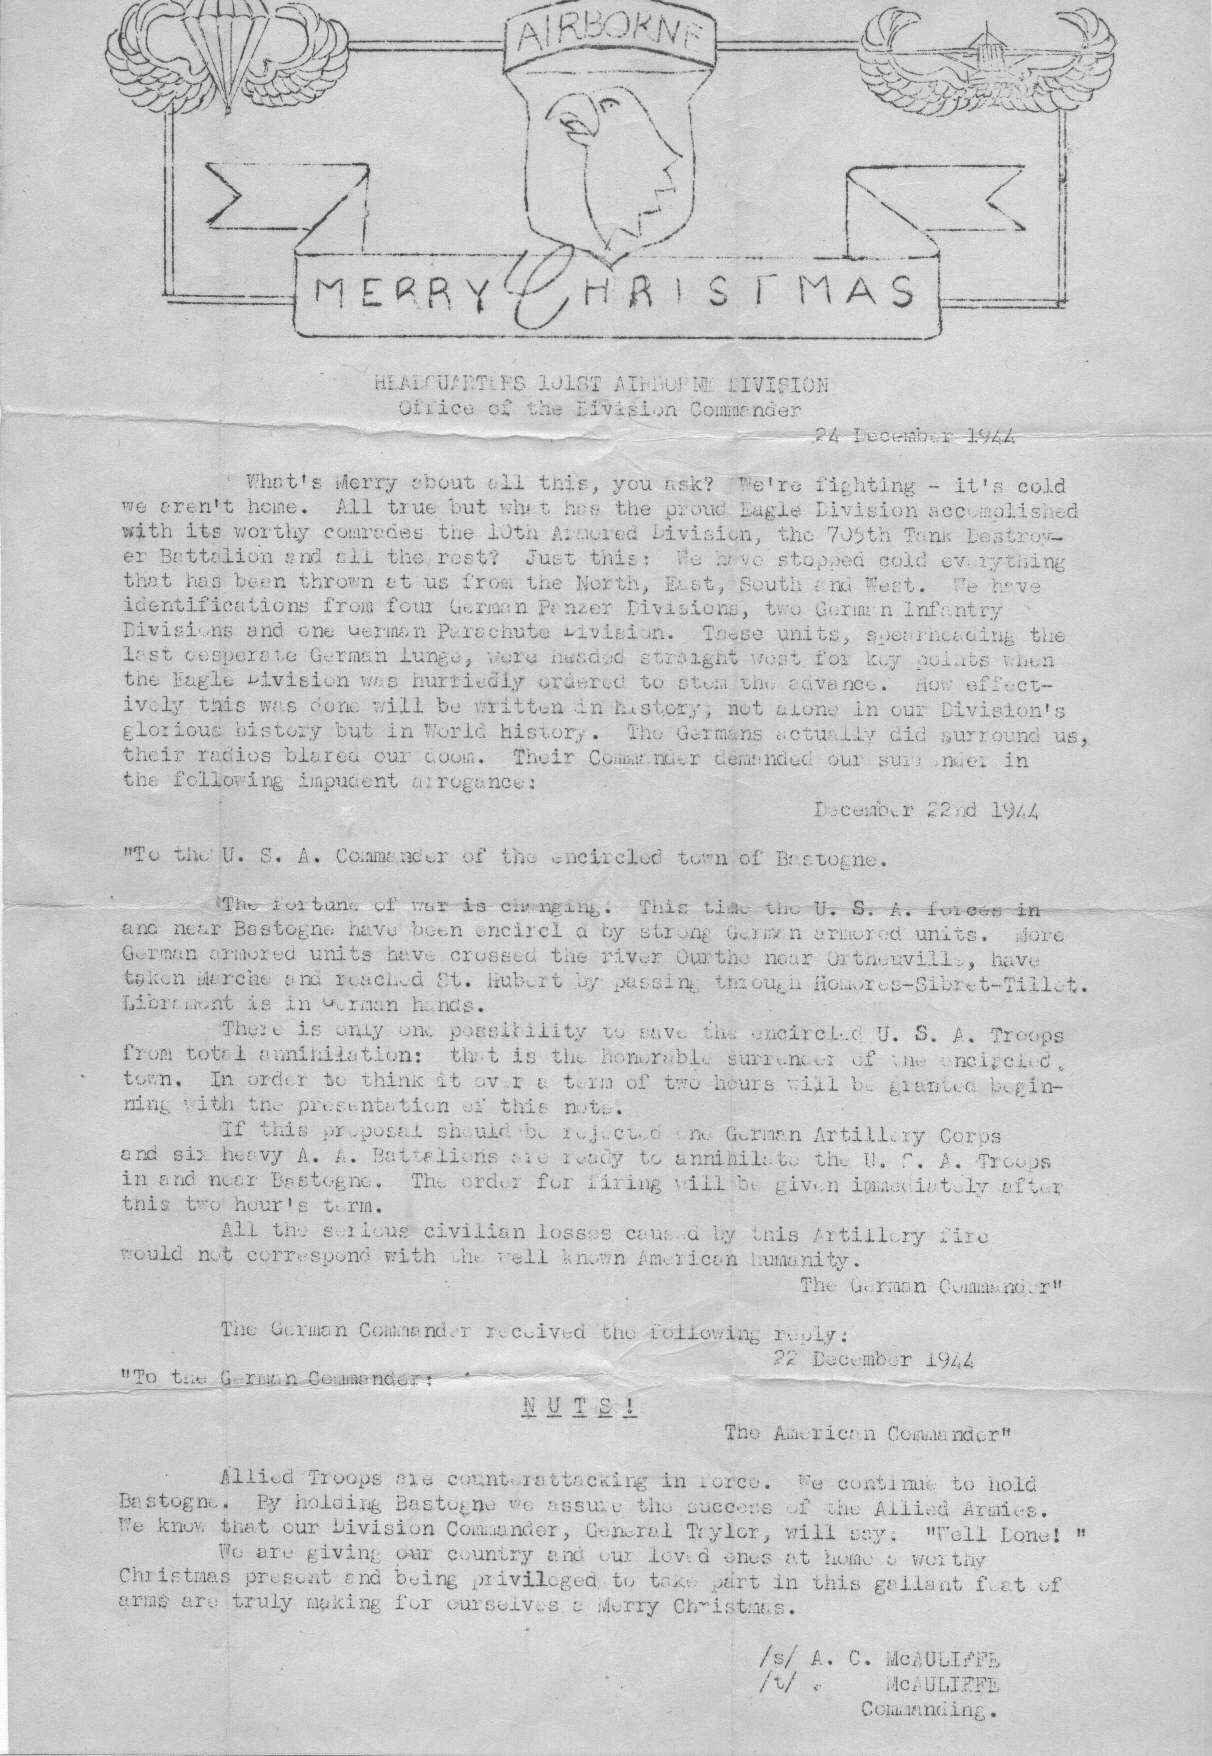 Today in World War II History—December 22, 1939 & 1944